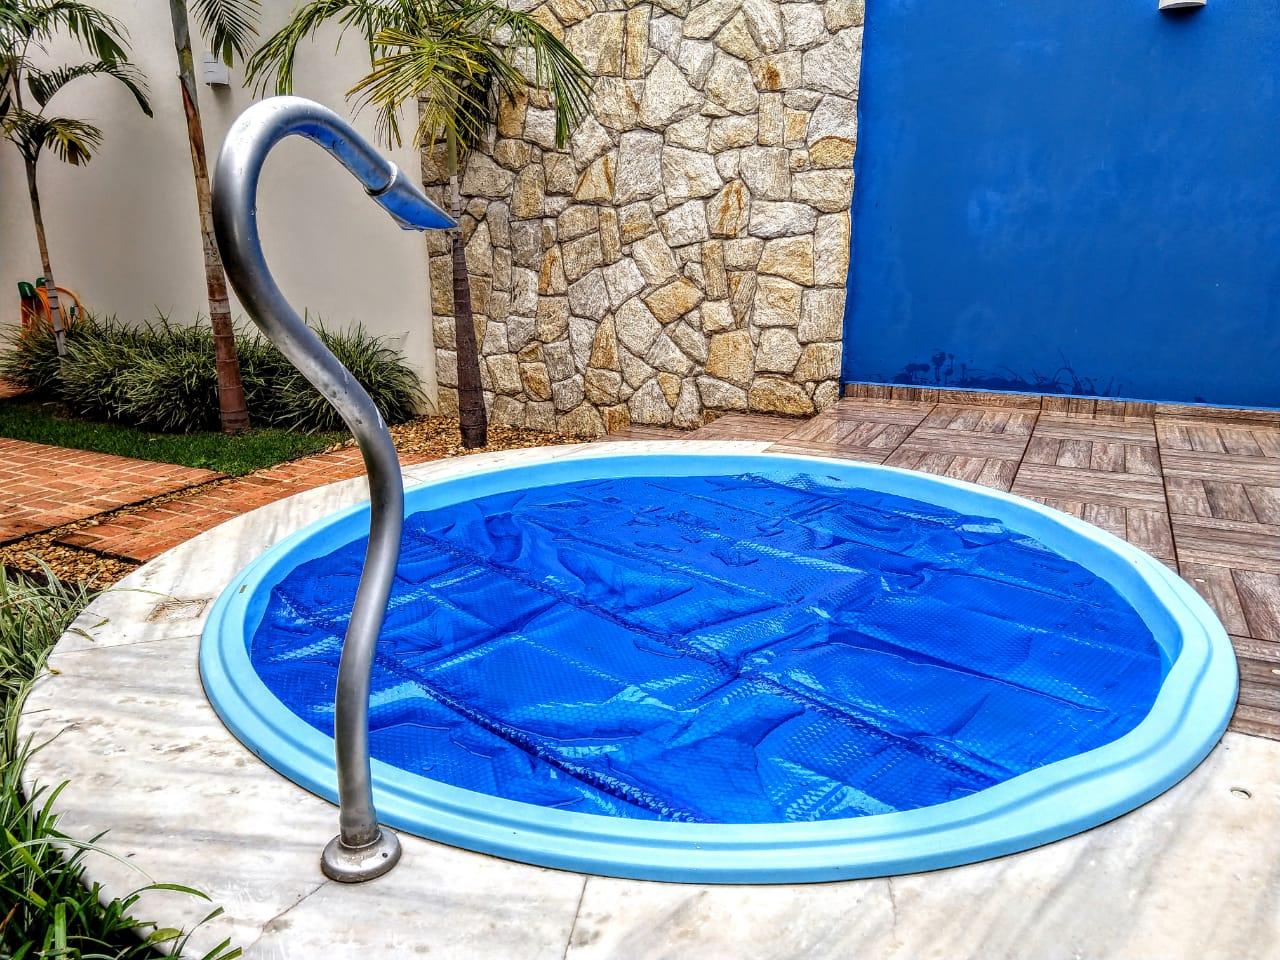 Capa Termica Bolha  8,00M X 4,00M - Brasil Capas ( 500 Micras )